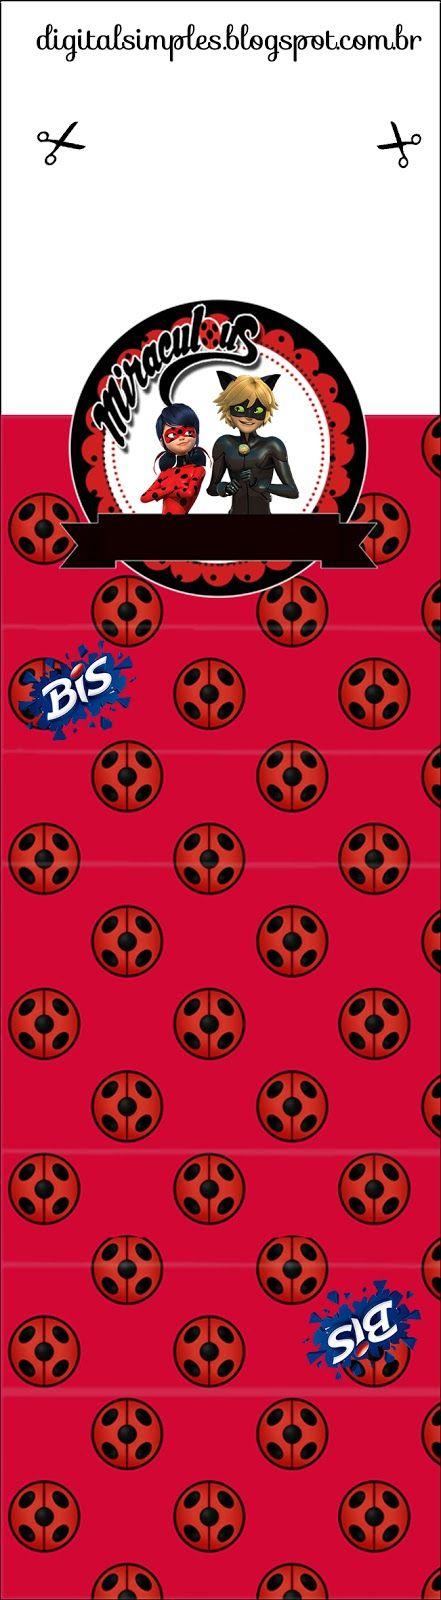 bis+duplo+2++miraculous+ladybug+5%2C5+x+14%2C22.jpg (441×1600)